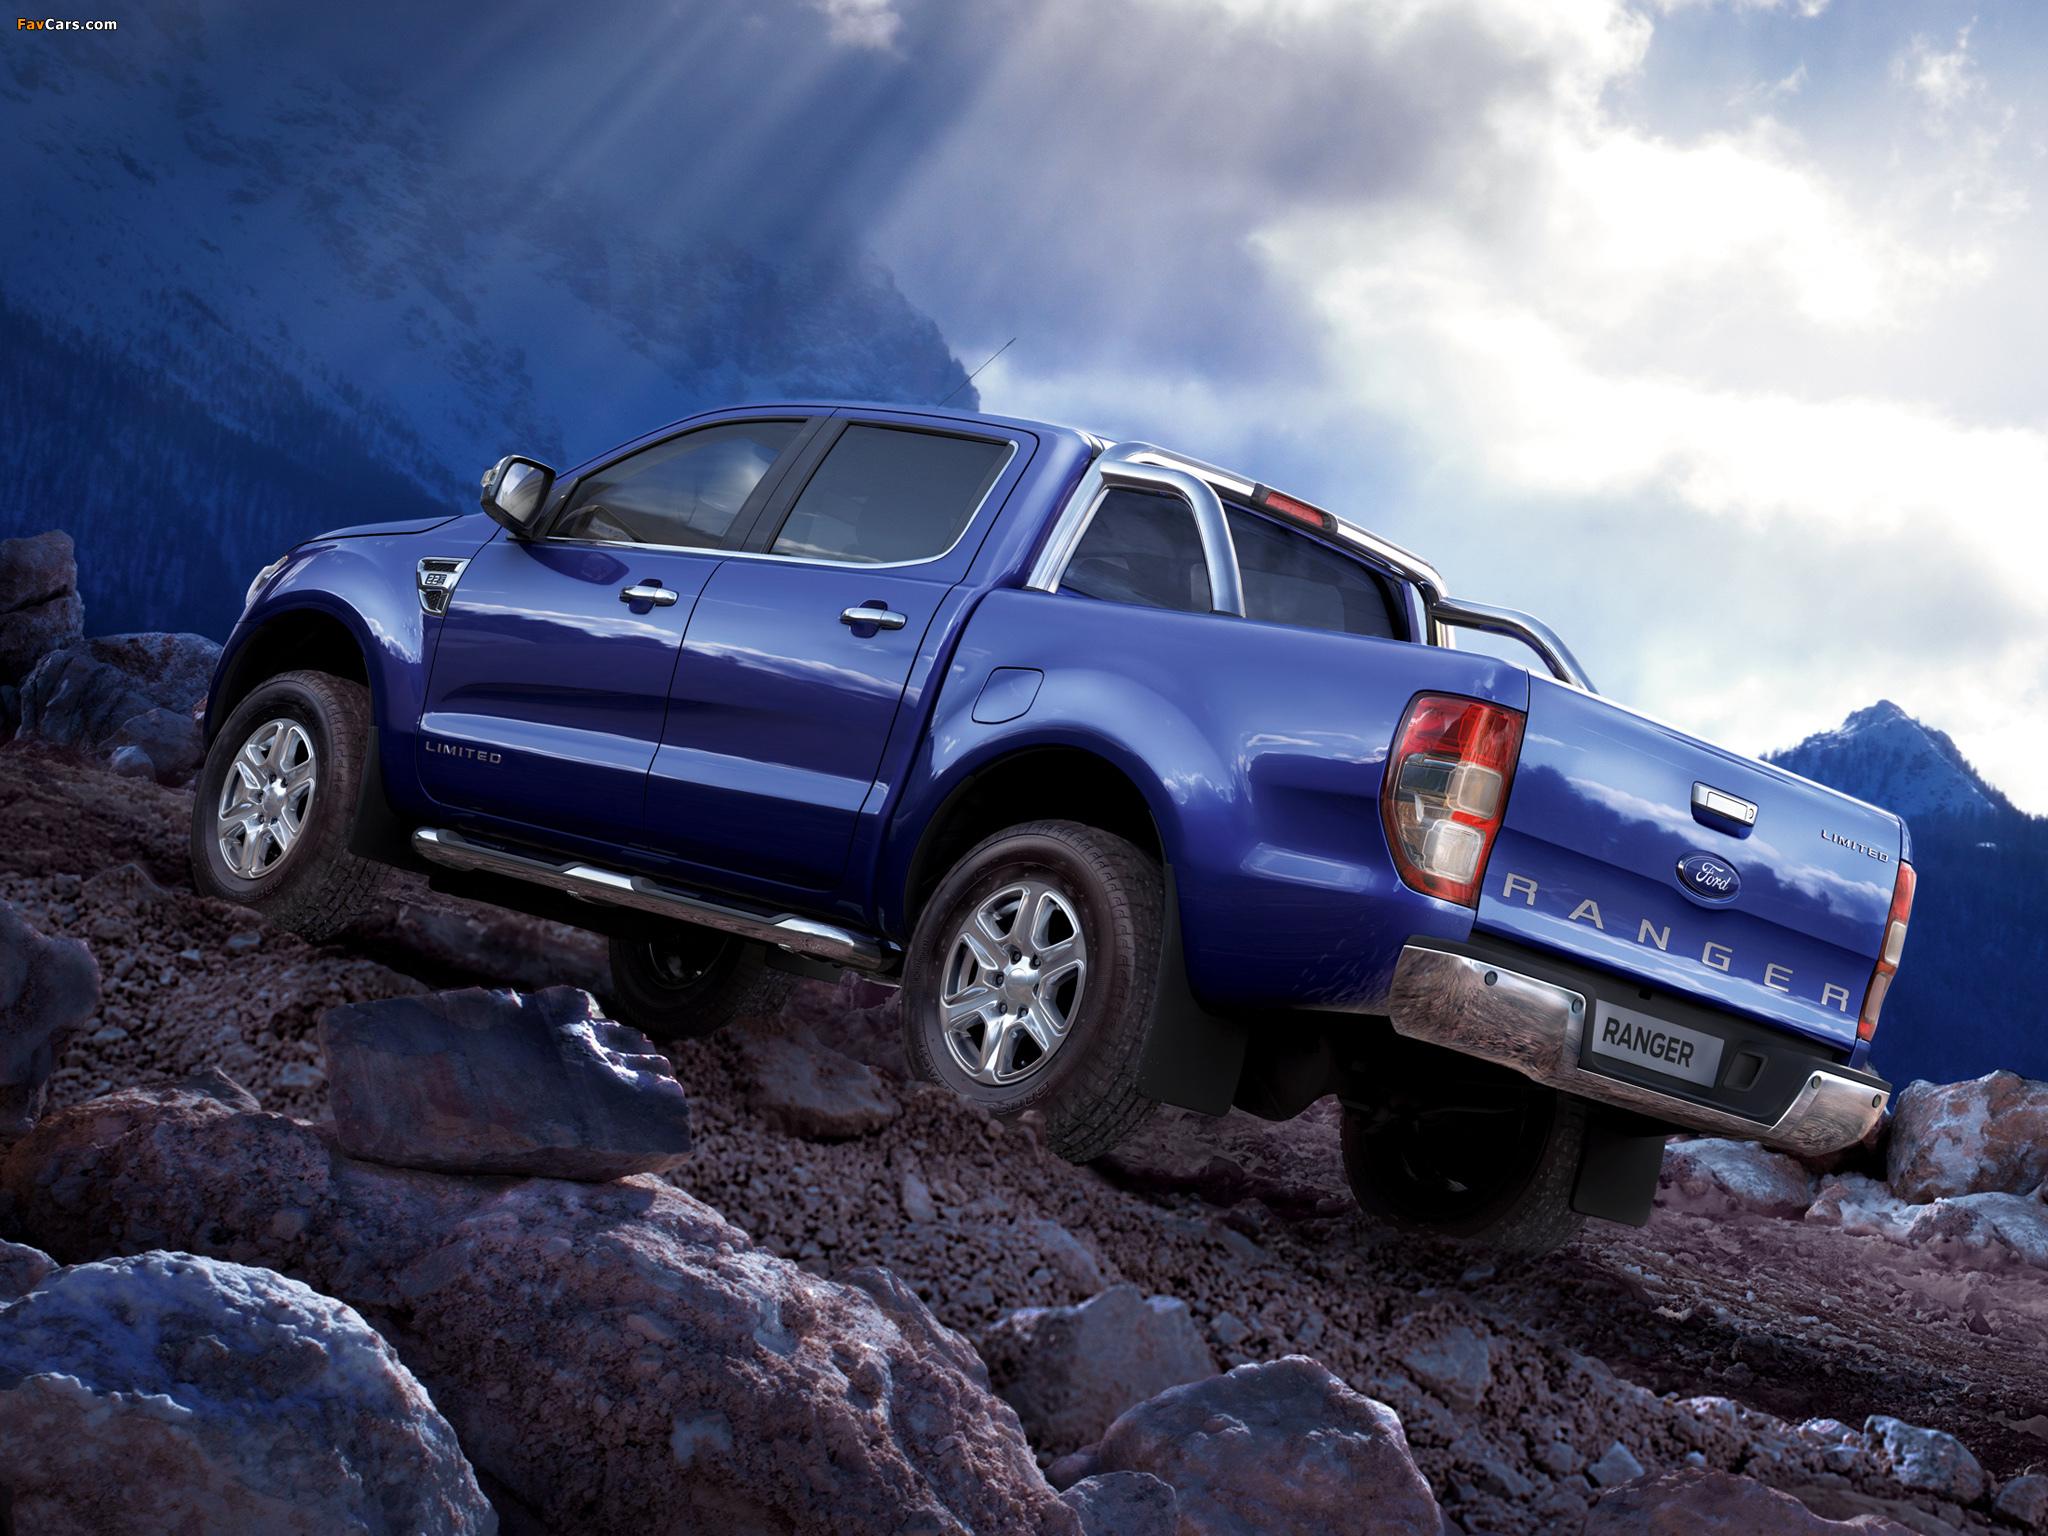 синий автомобиль джип ford new ranger загрузить